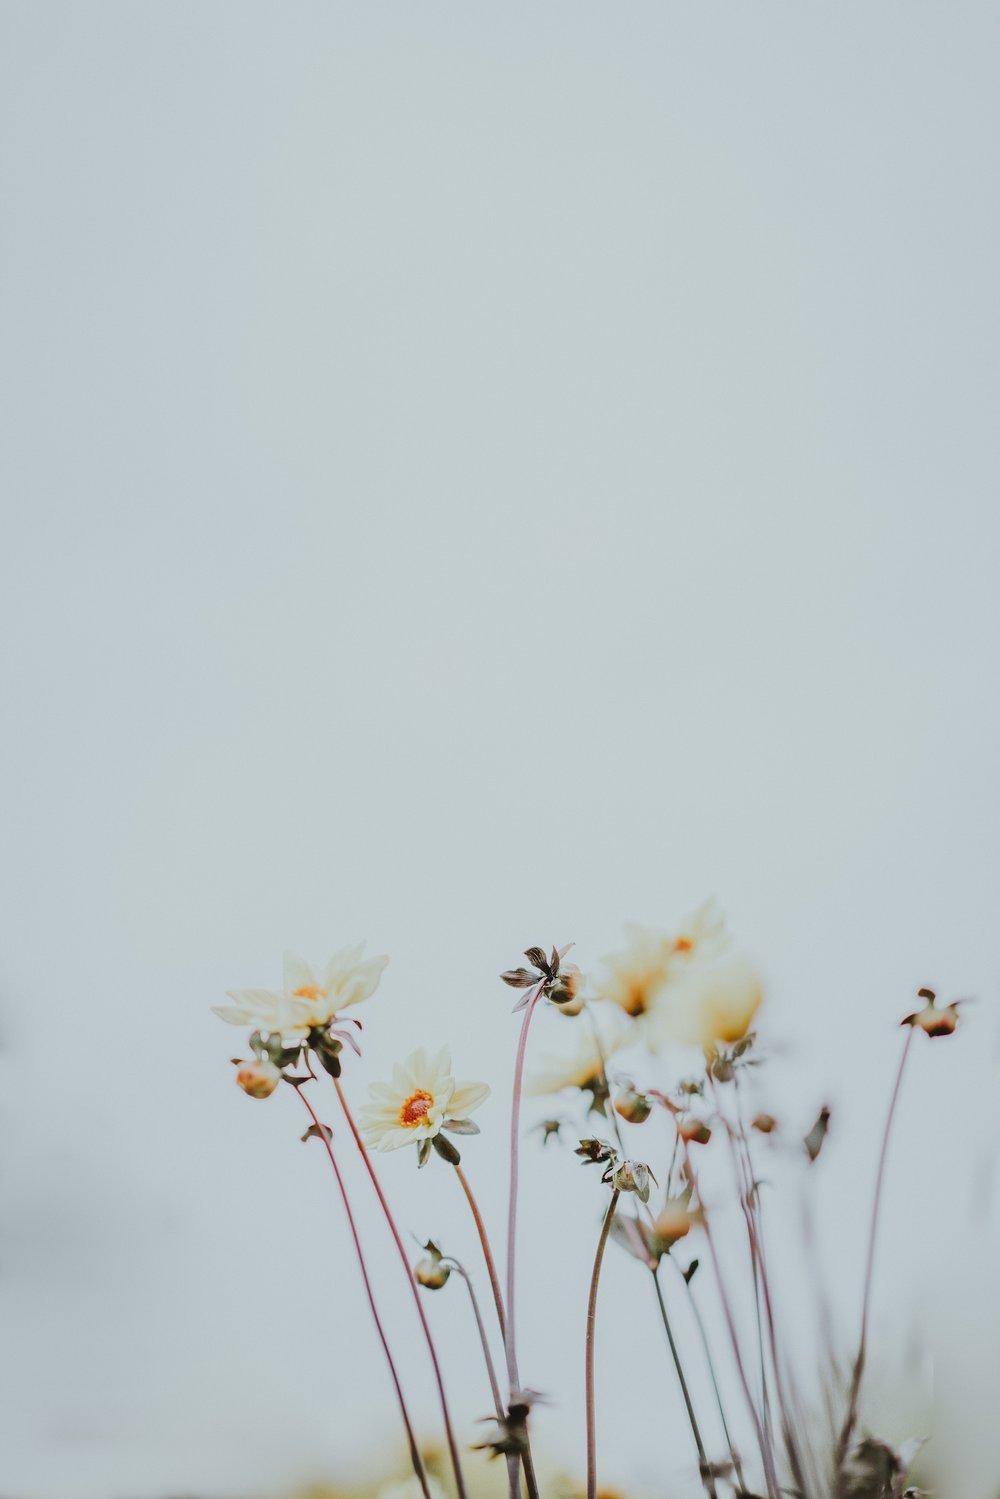 flowers-simplicity-uncluttered-unsplash.jpg